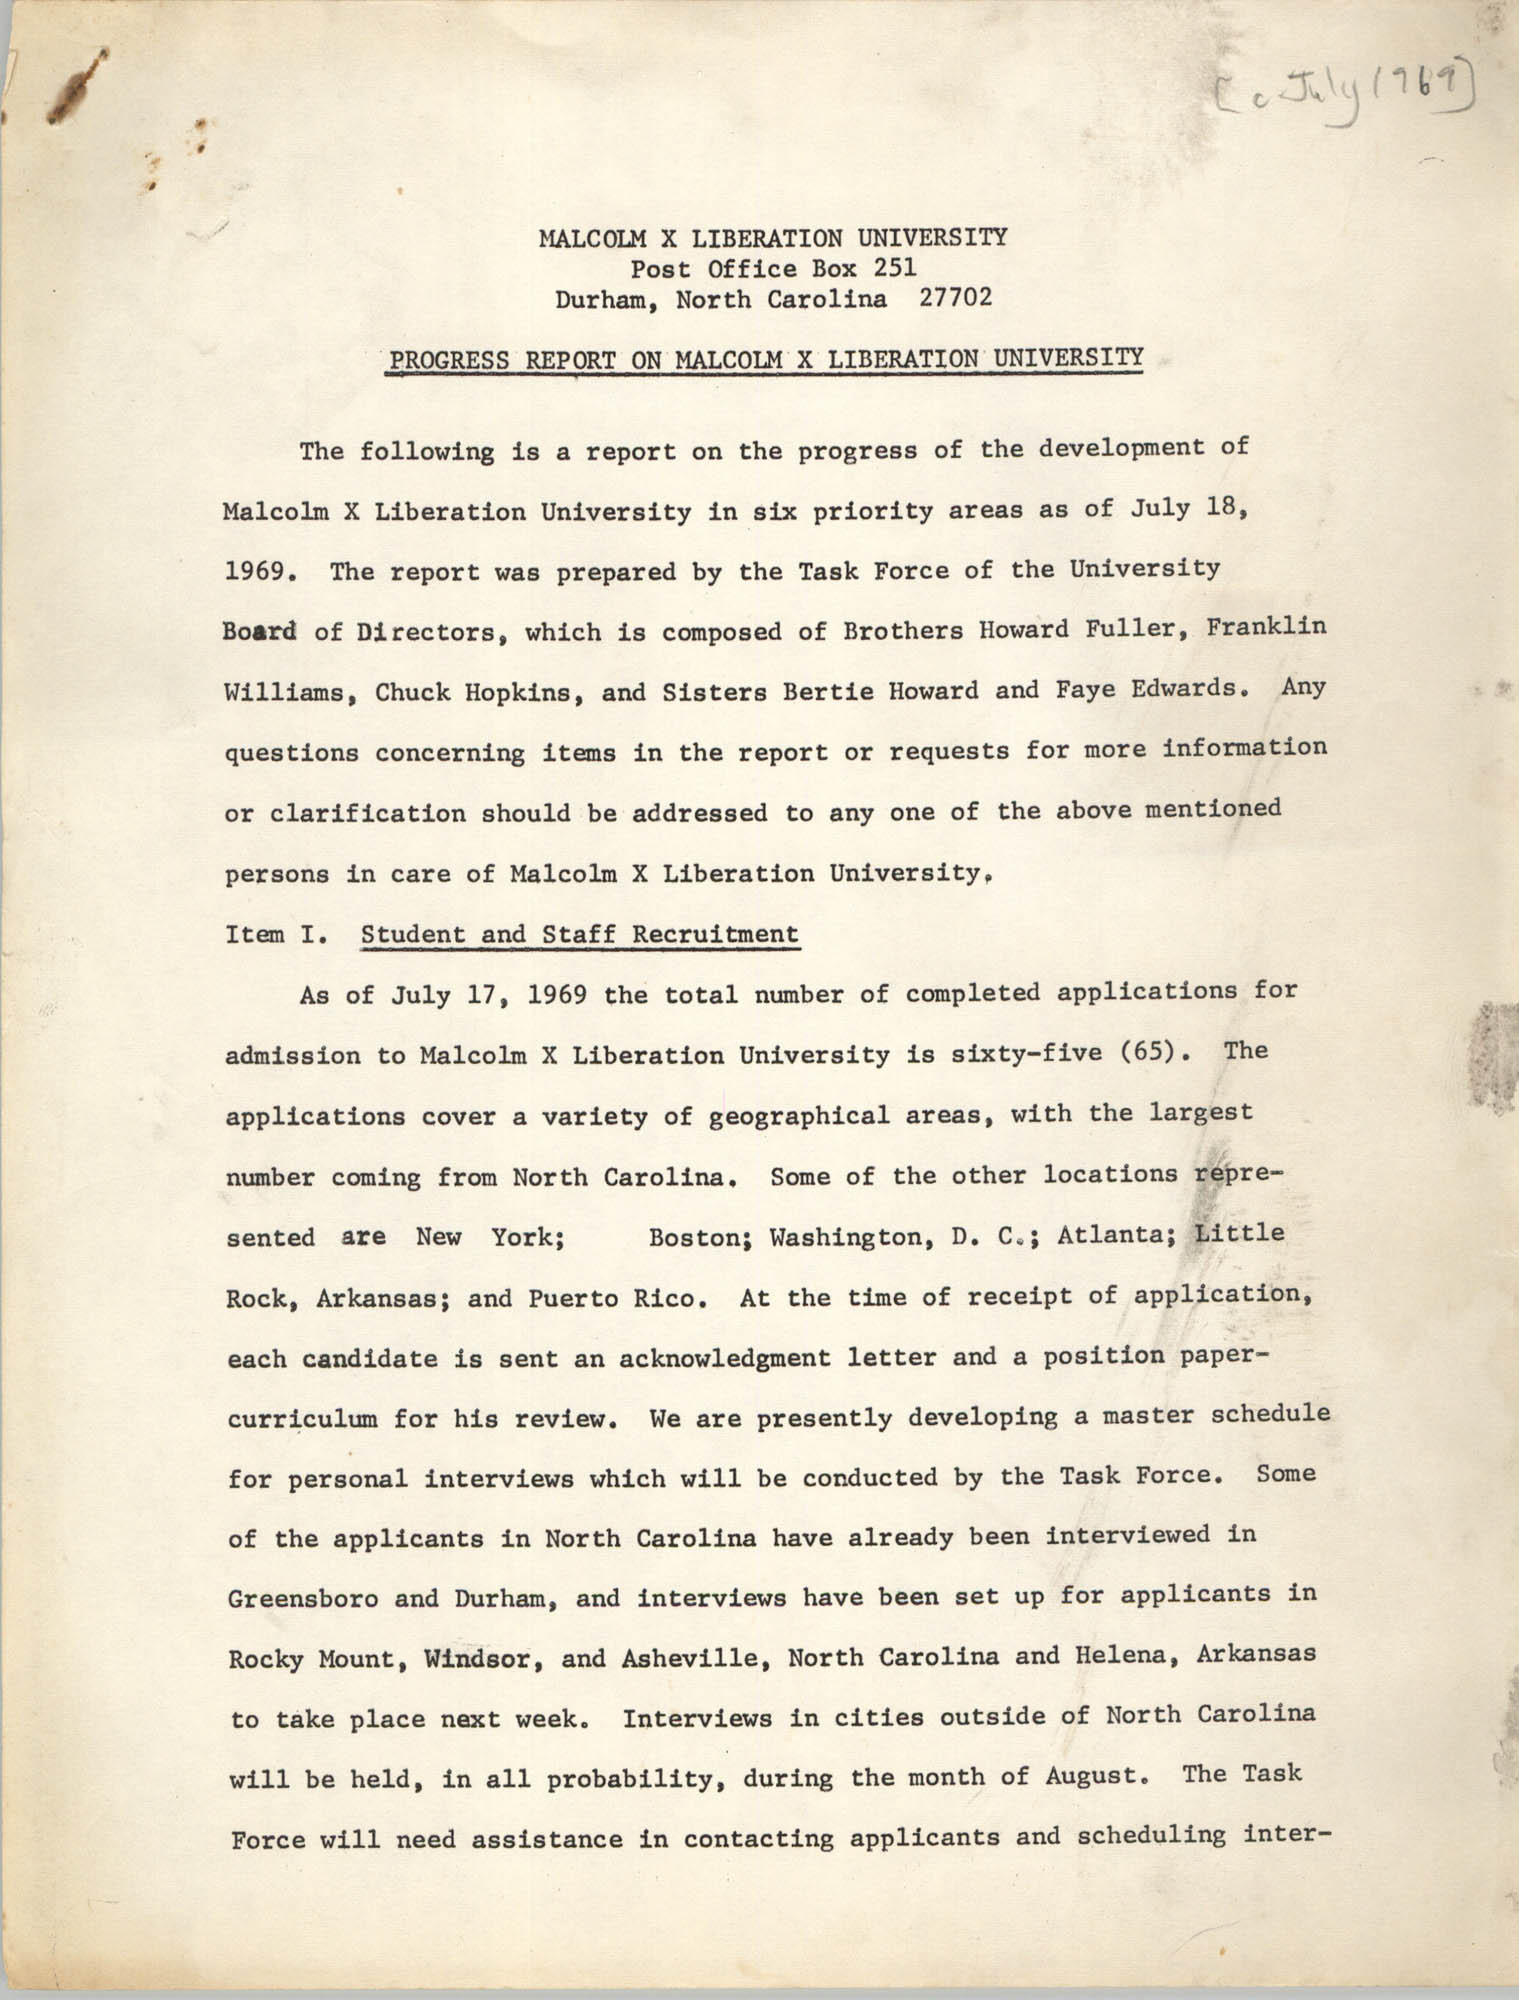 Progress Report on Malcolm X Liberation University, July 1969